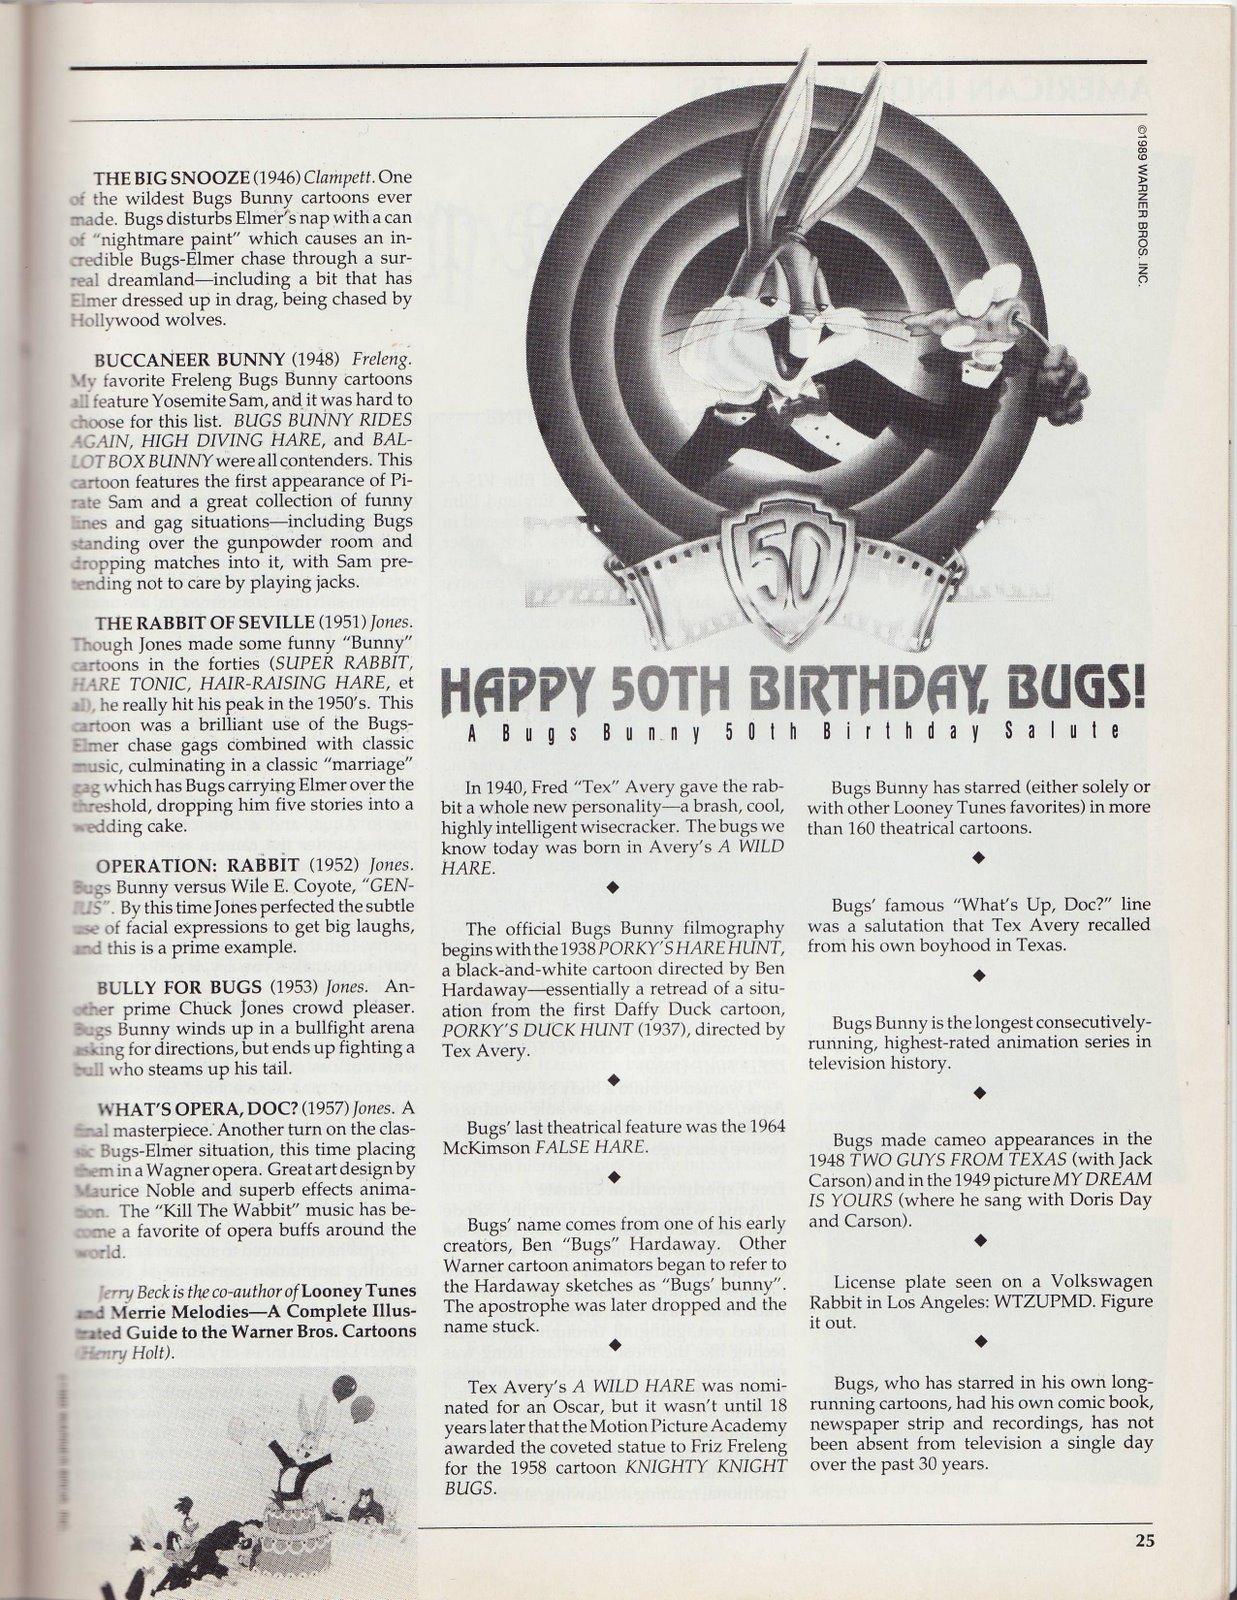 [Animation+magazine+vol+3+issue+3+1990+Bugs]